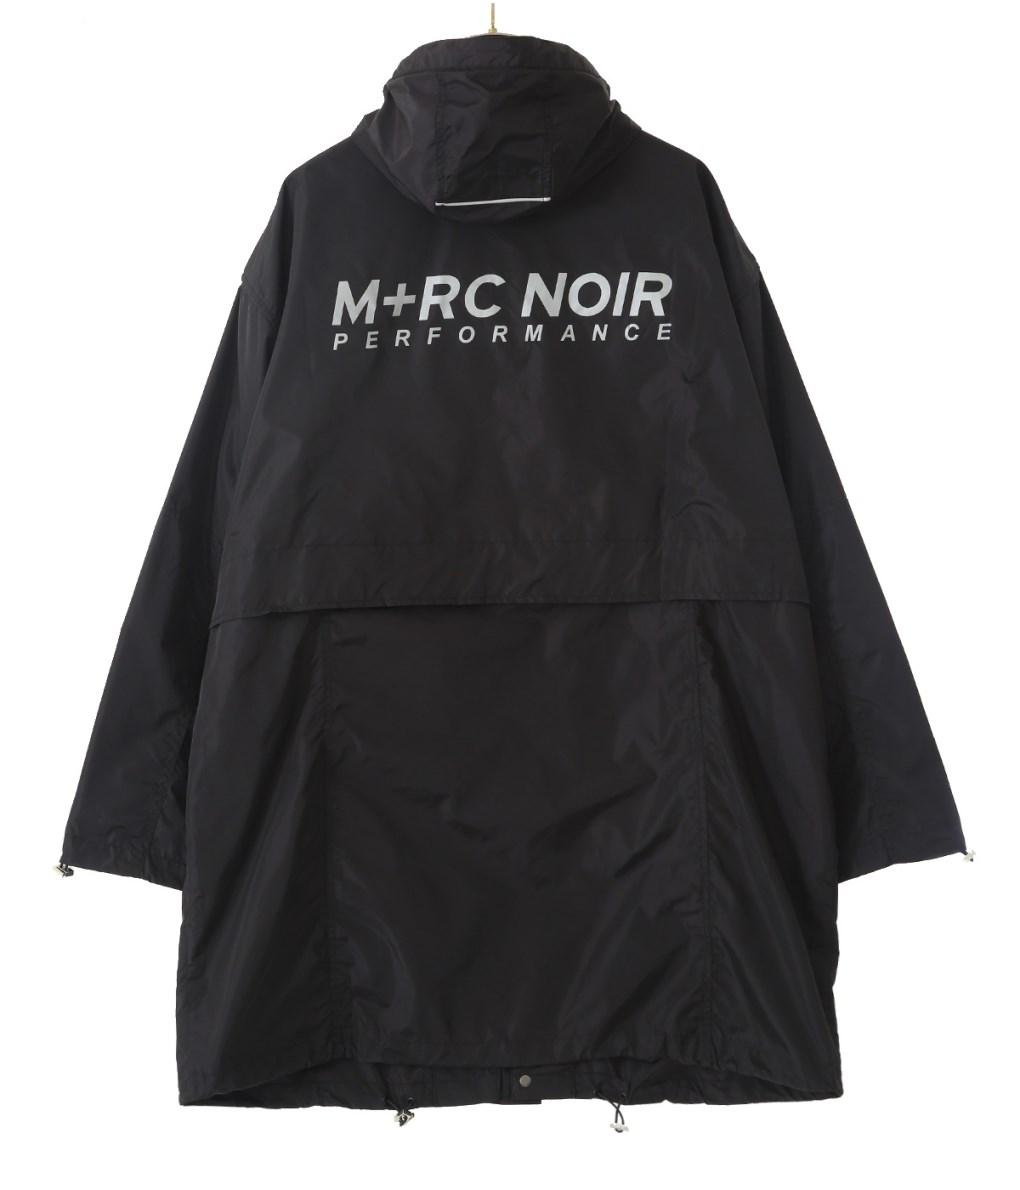 M+RC NOIR / マルシェノア : M+RC PERFORMANCE PARKA : マルシェ パフォーマンス パーカ 20SS 20春夏 : 36004 【WAX】